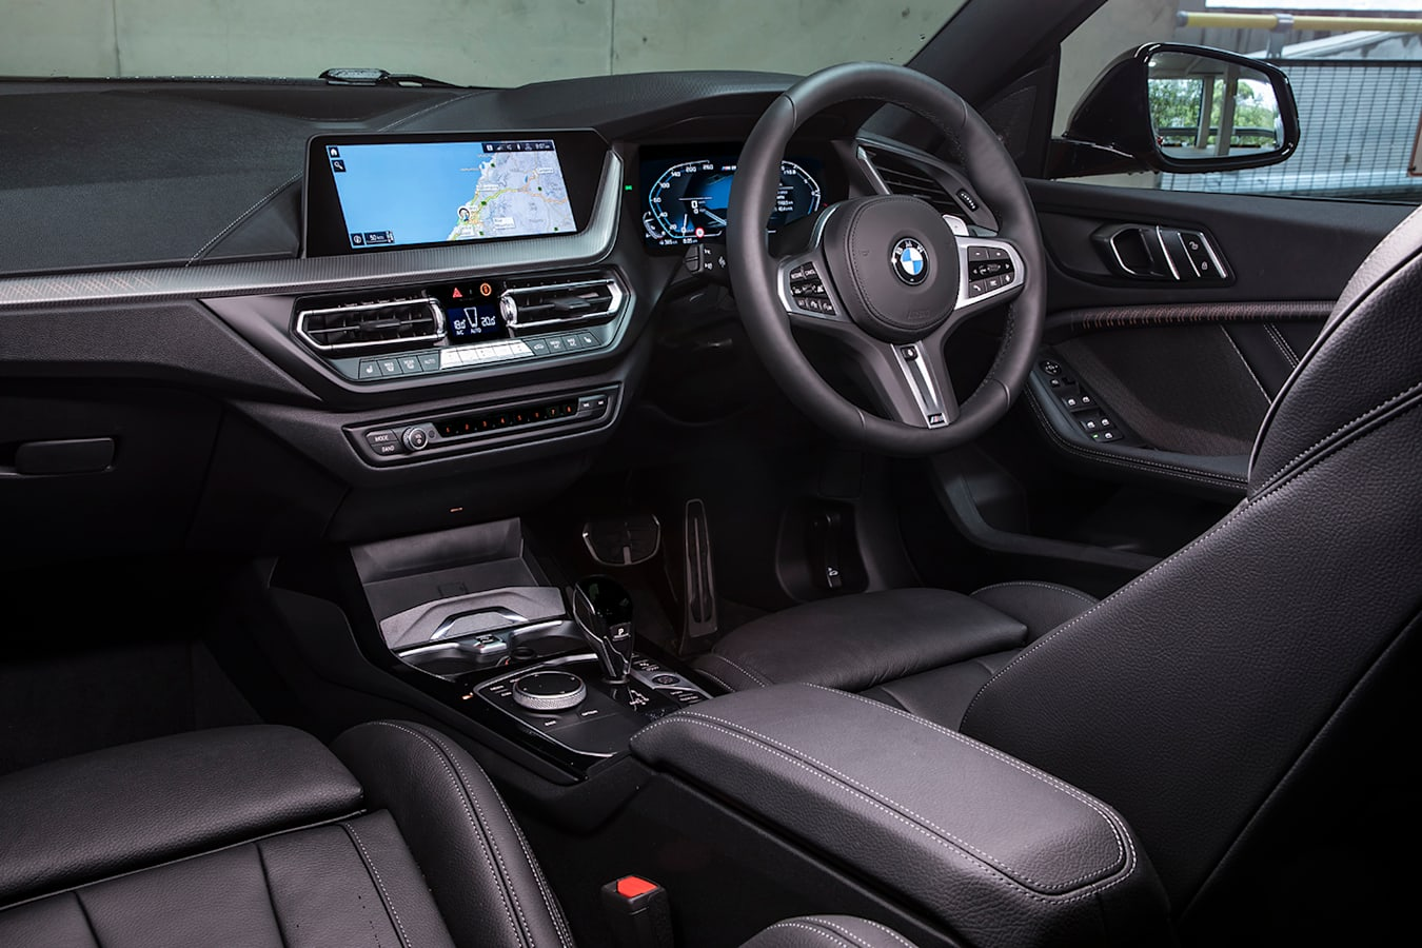 BMW 2 Series Gran Coupe infotainment